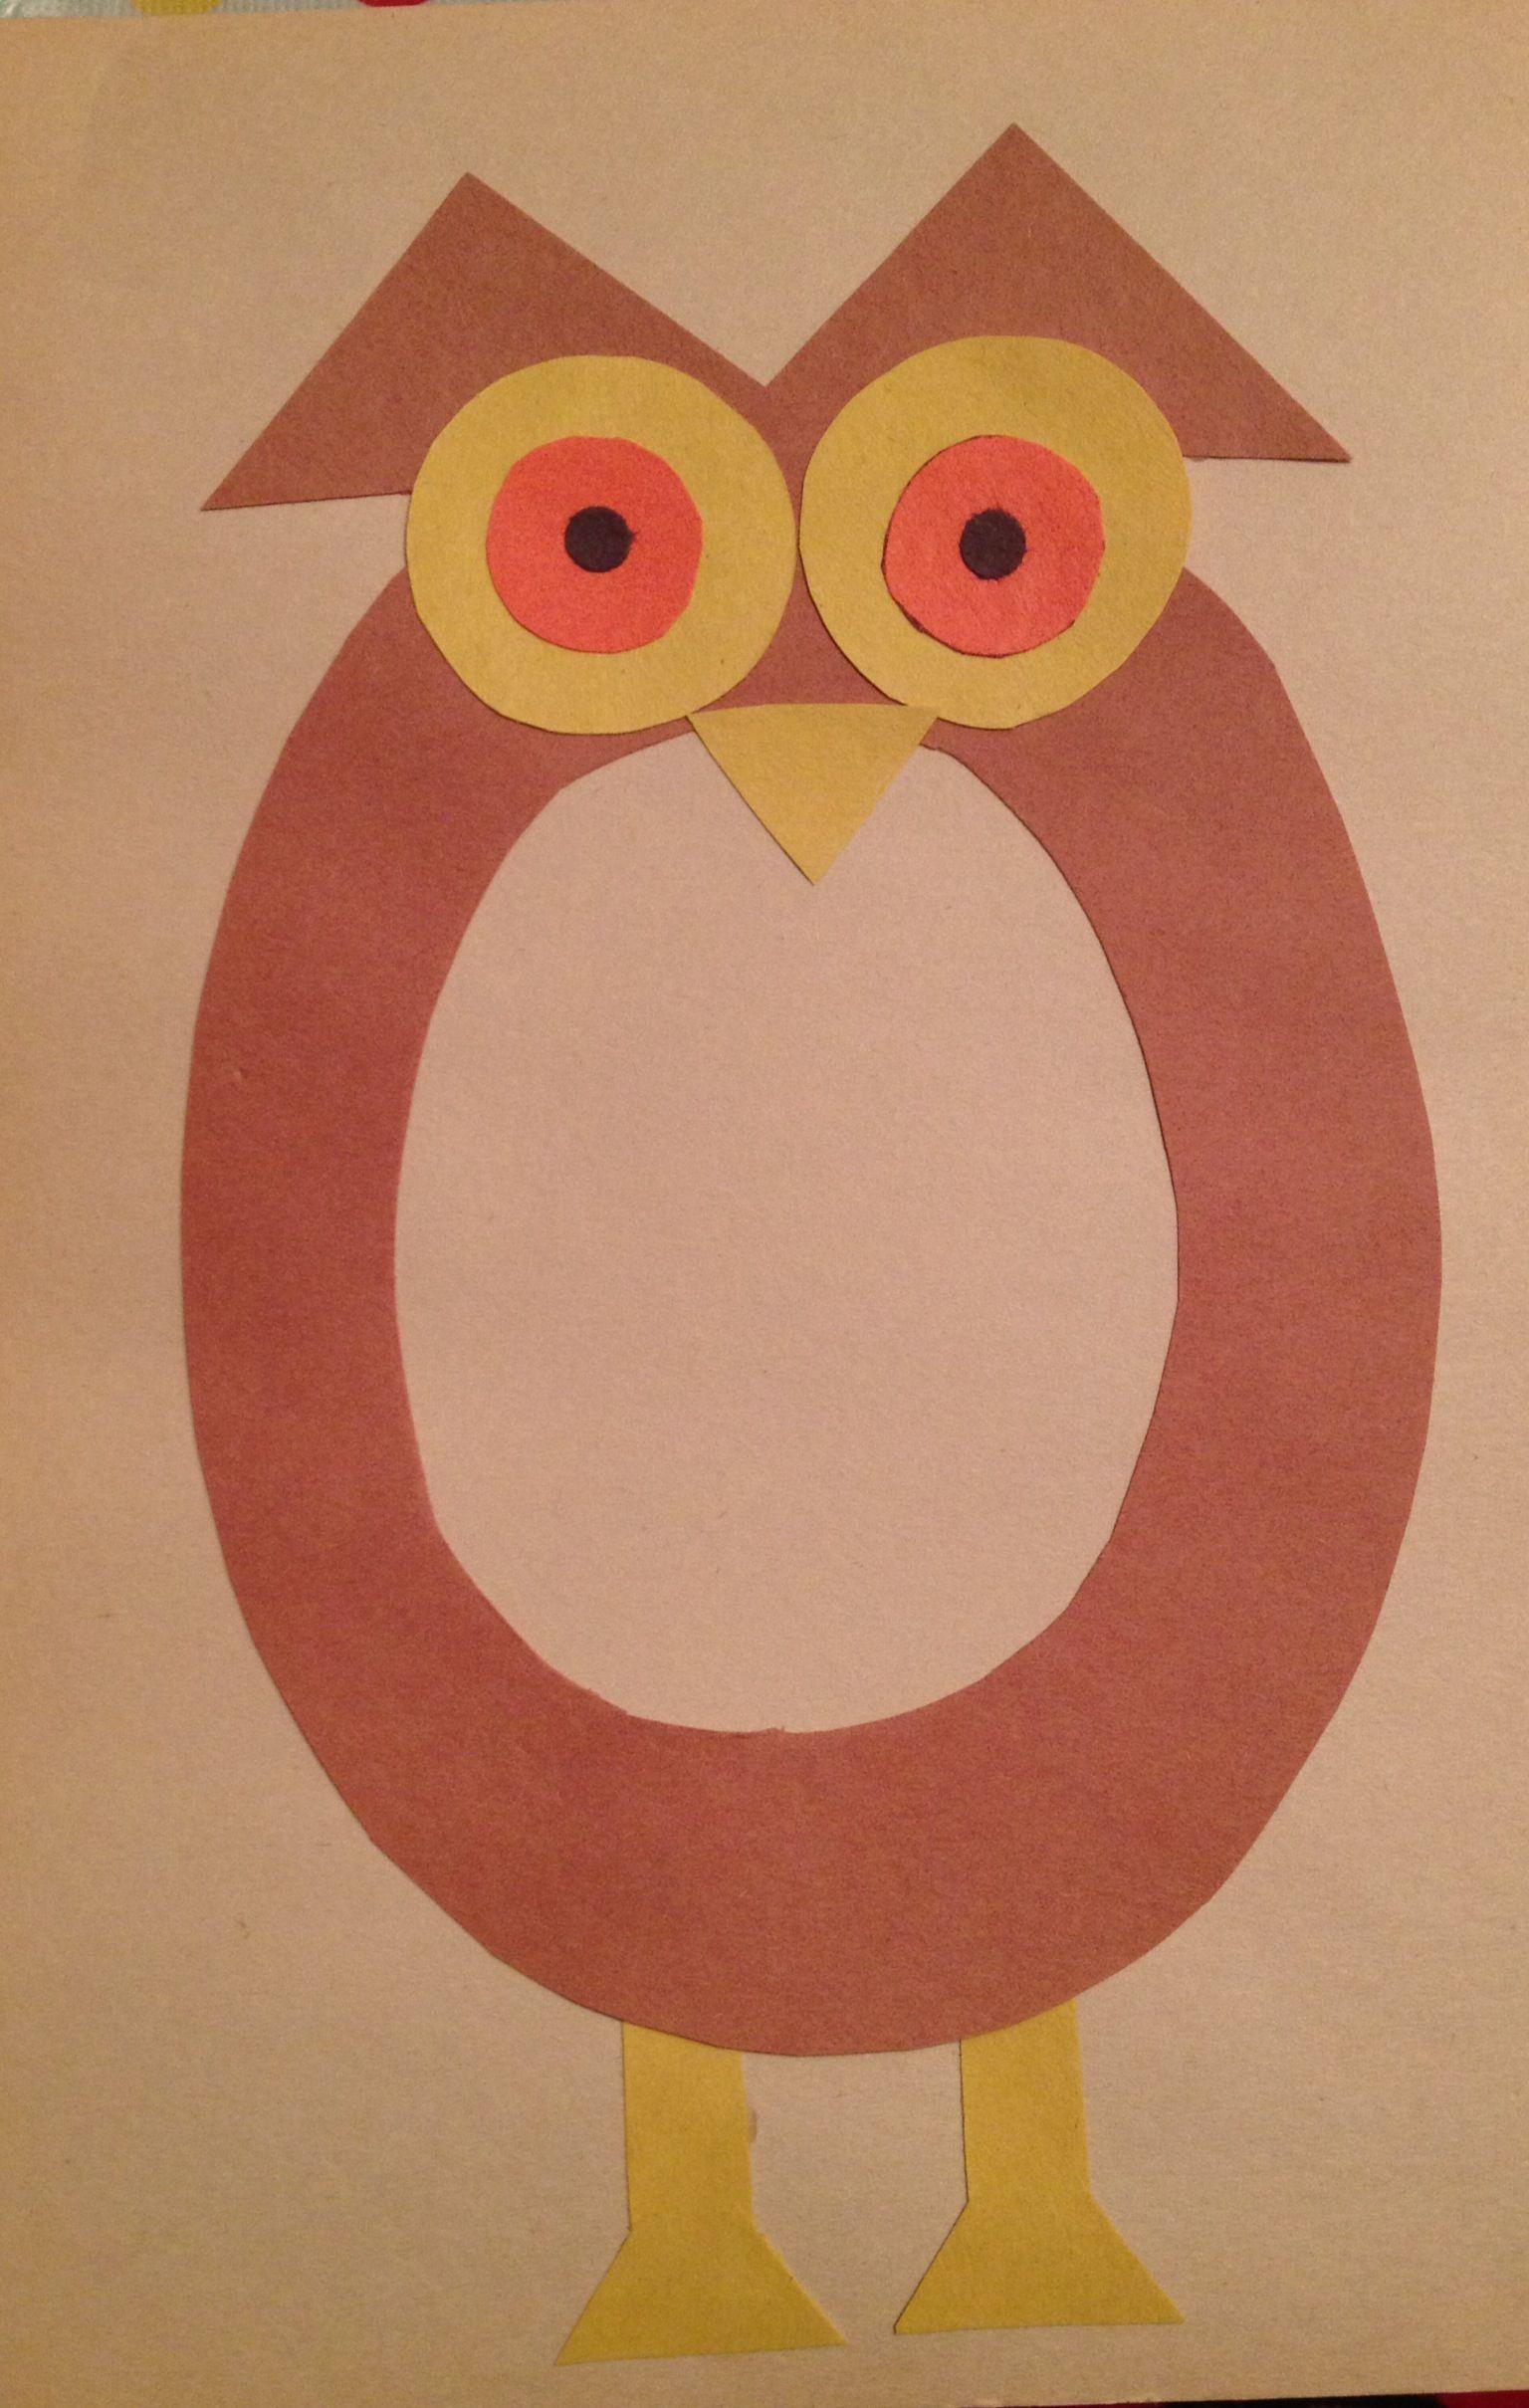 Preschool letter O craft | Preschool Letter Crafts | Preschool